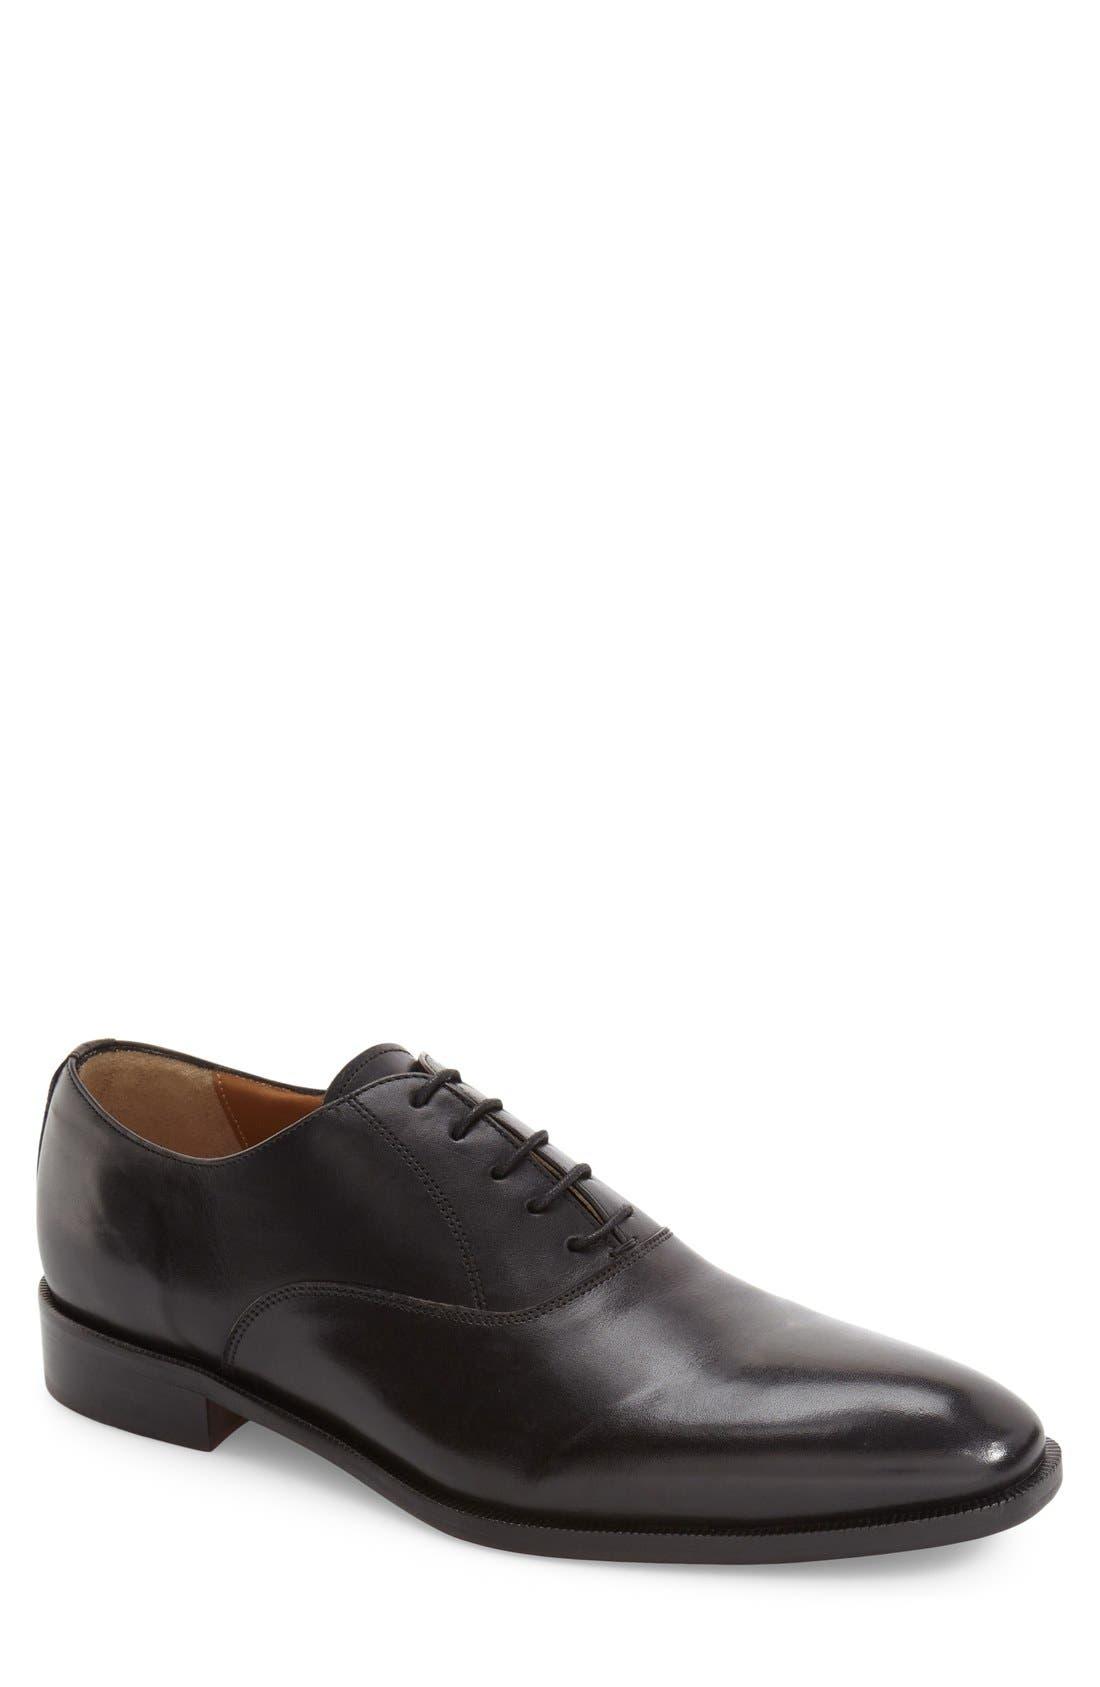 Top Coat Plain Toe Oxford,                         Main,                         color, 001